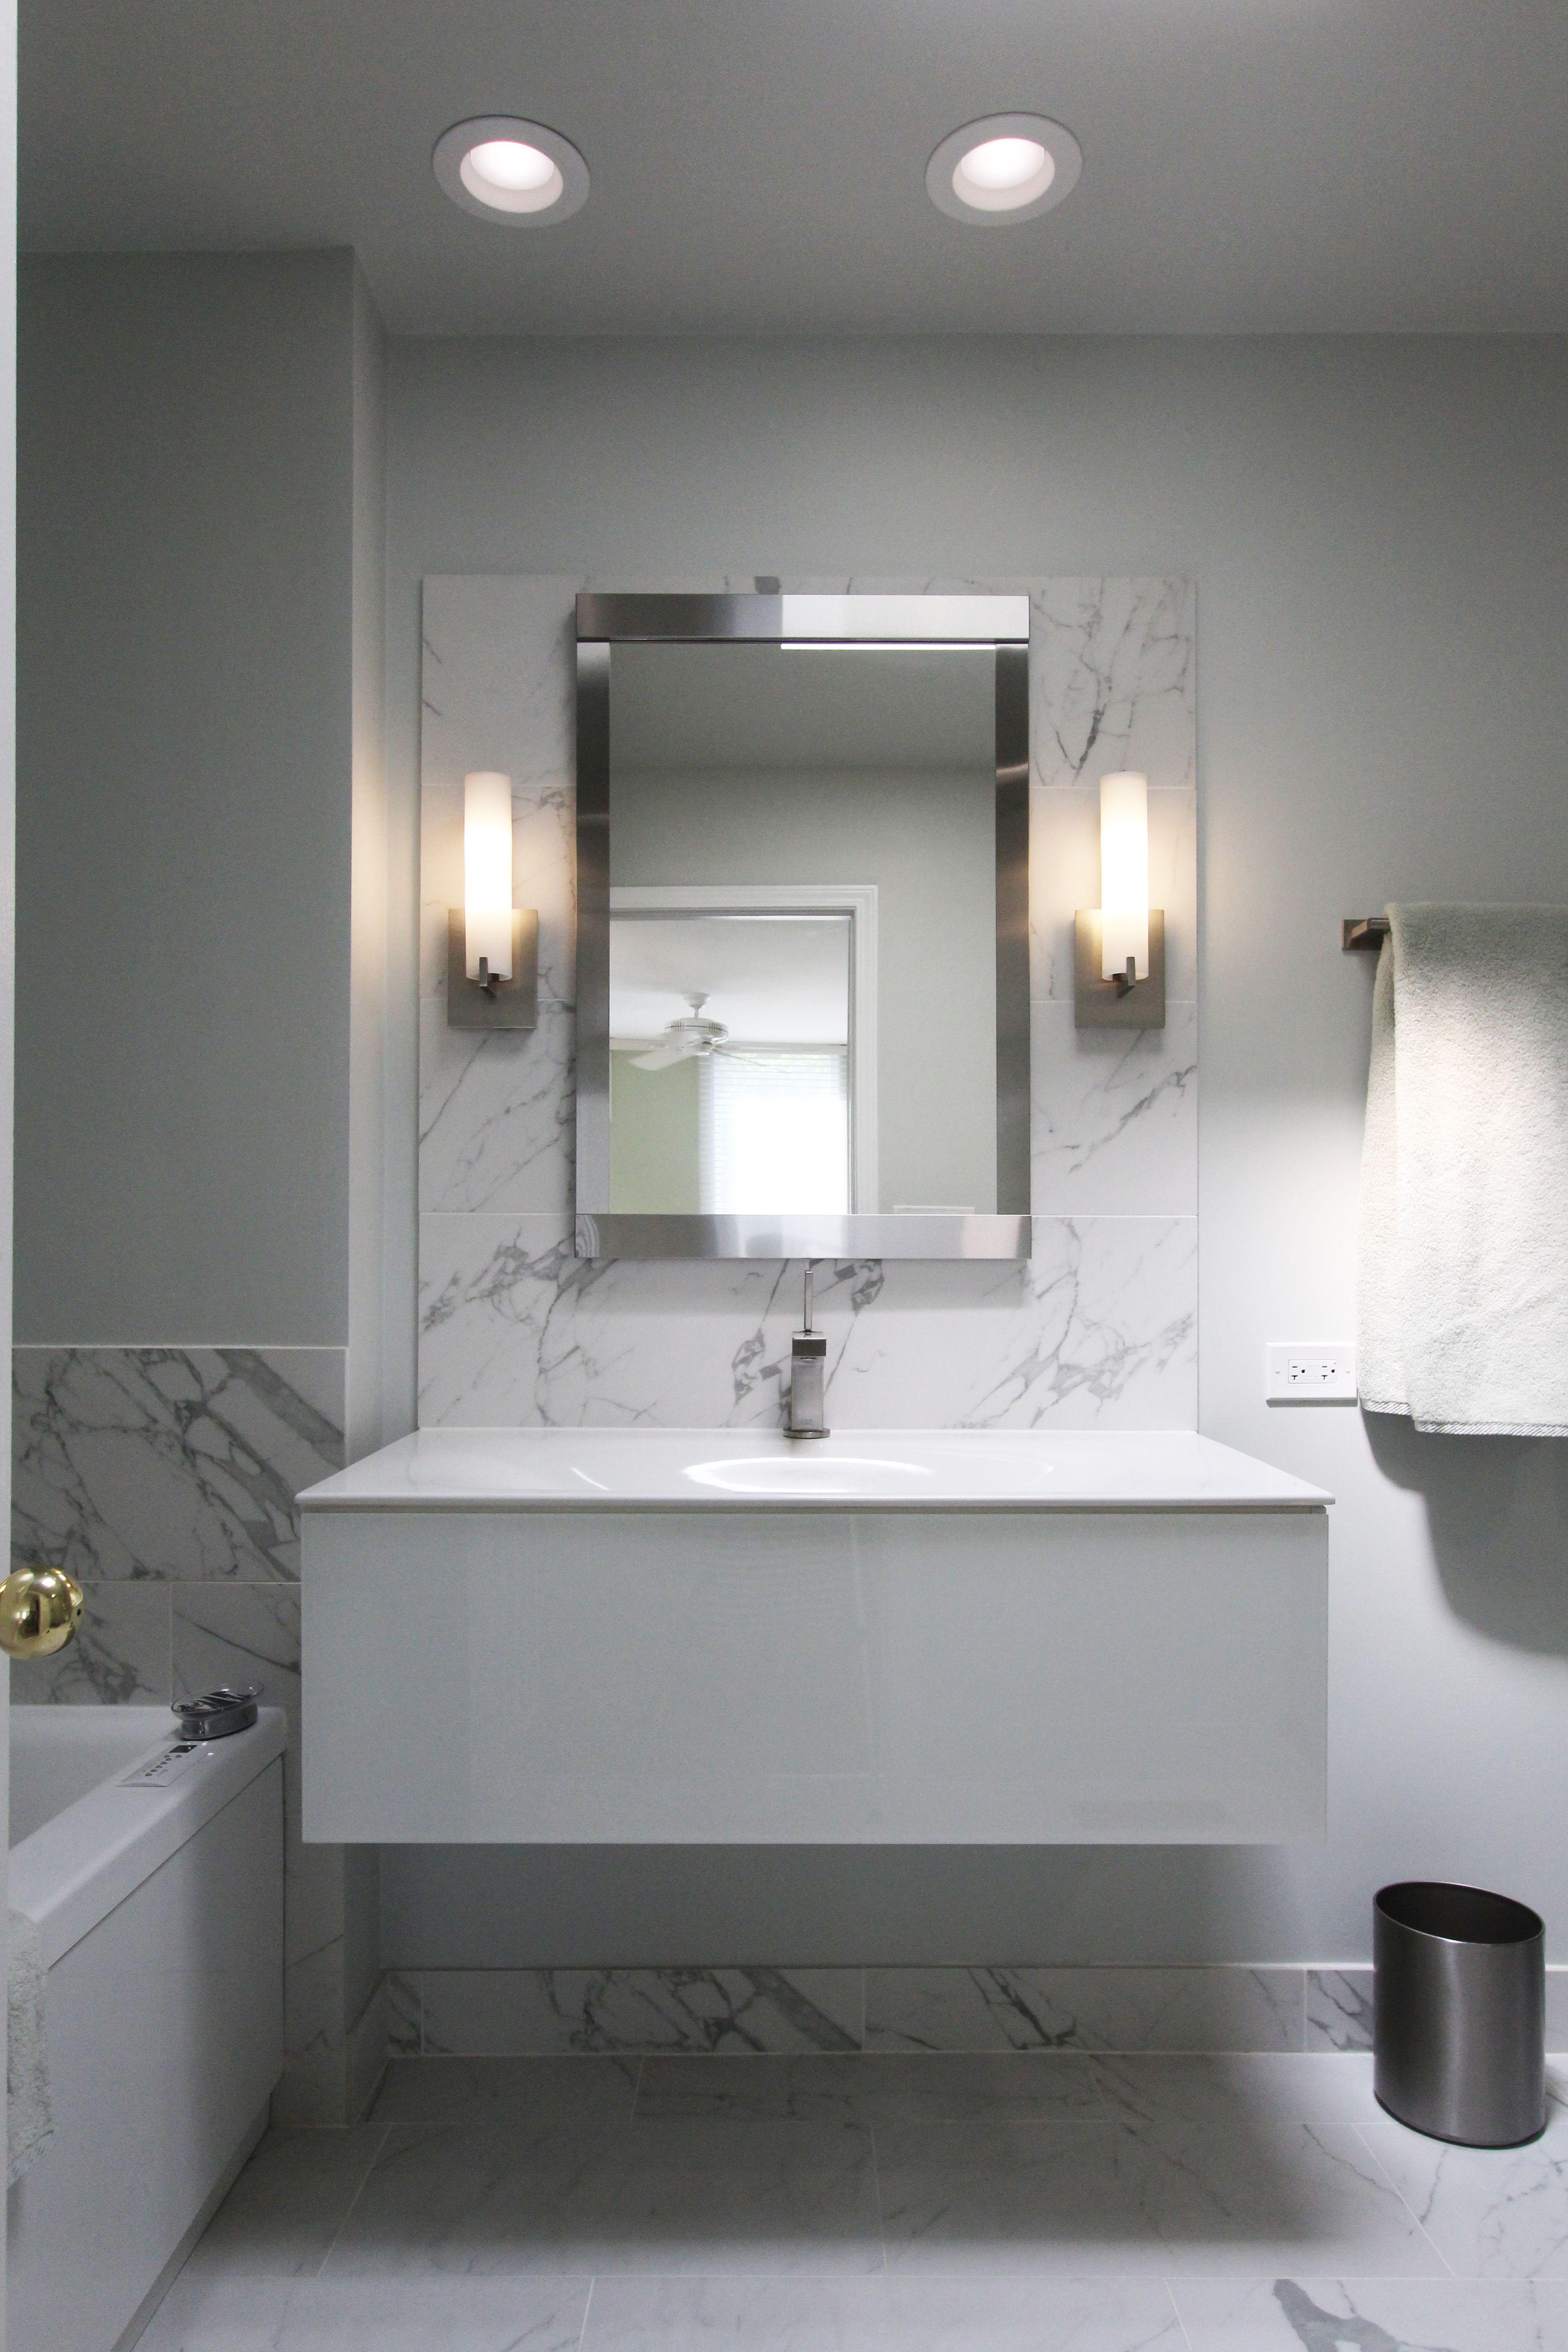 Modern Minimal Bathroom Design Sleek Look For A Bachelor Pad Habitar Design Bathroom Design Unique Bathroom Beautiful Bathroom Designs